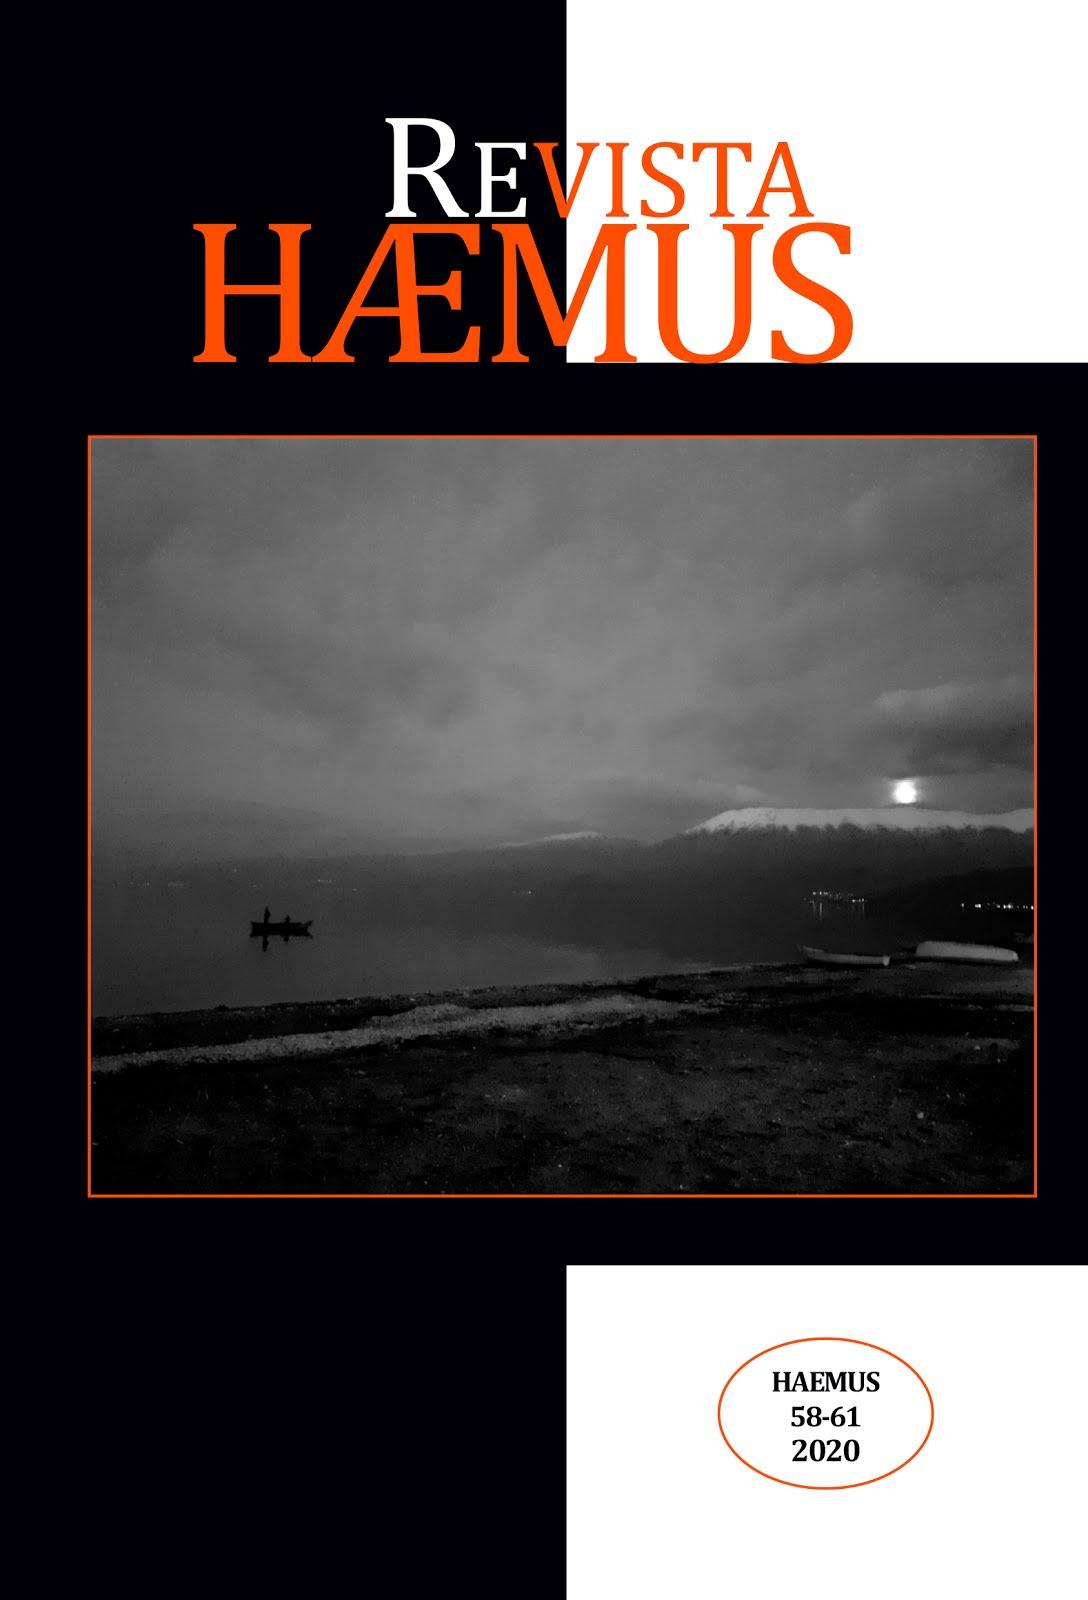 Revista Haemus Nr. 58-61